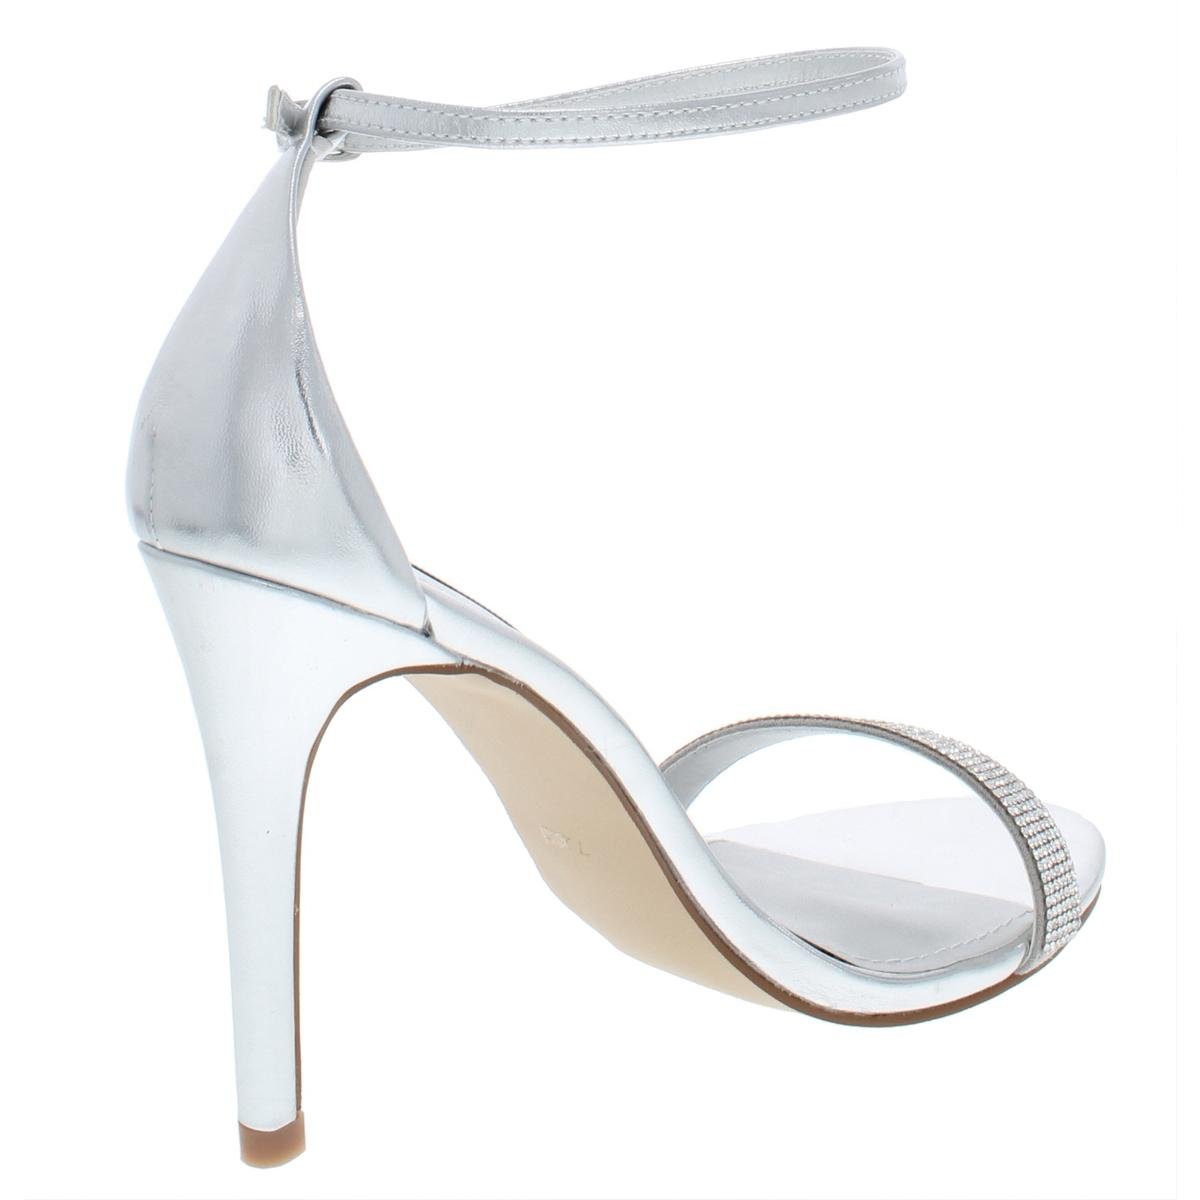 Steve-Madden-Womens-Stecy-Dress-Evening-Sandals-Shoes-BHFO-6444 thumbnail 10